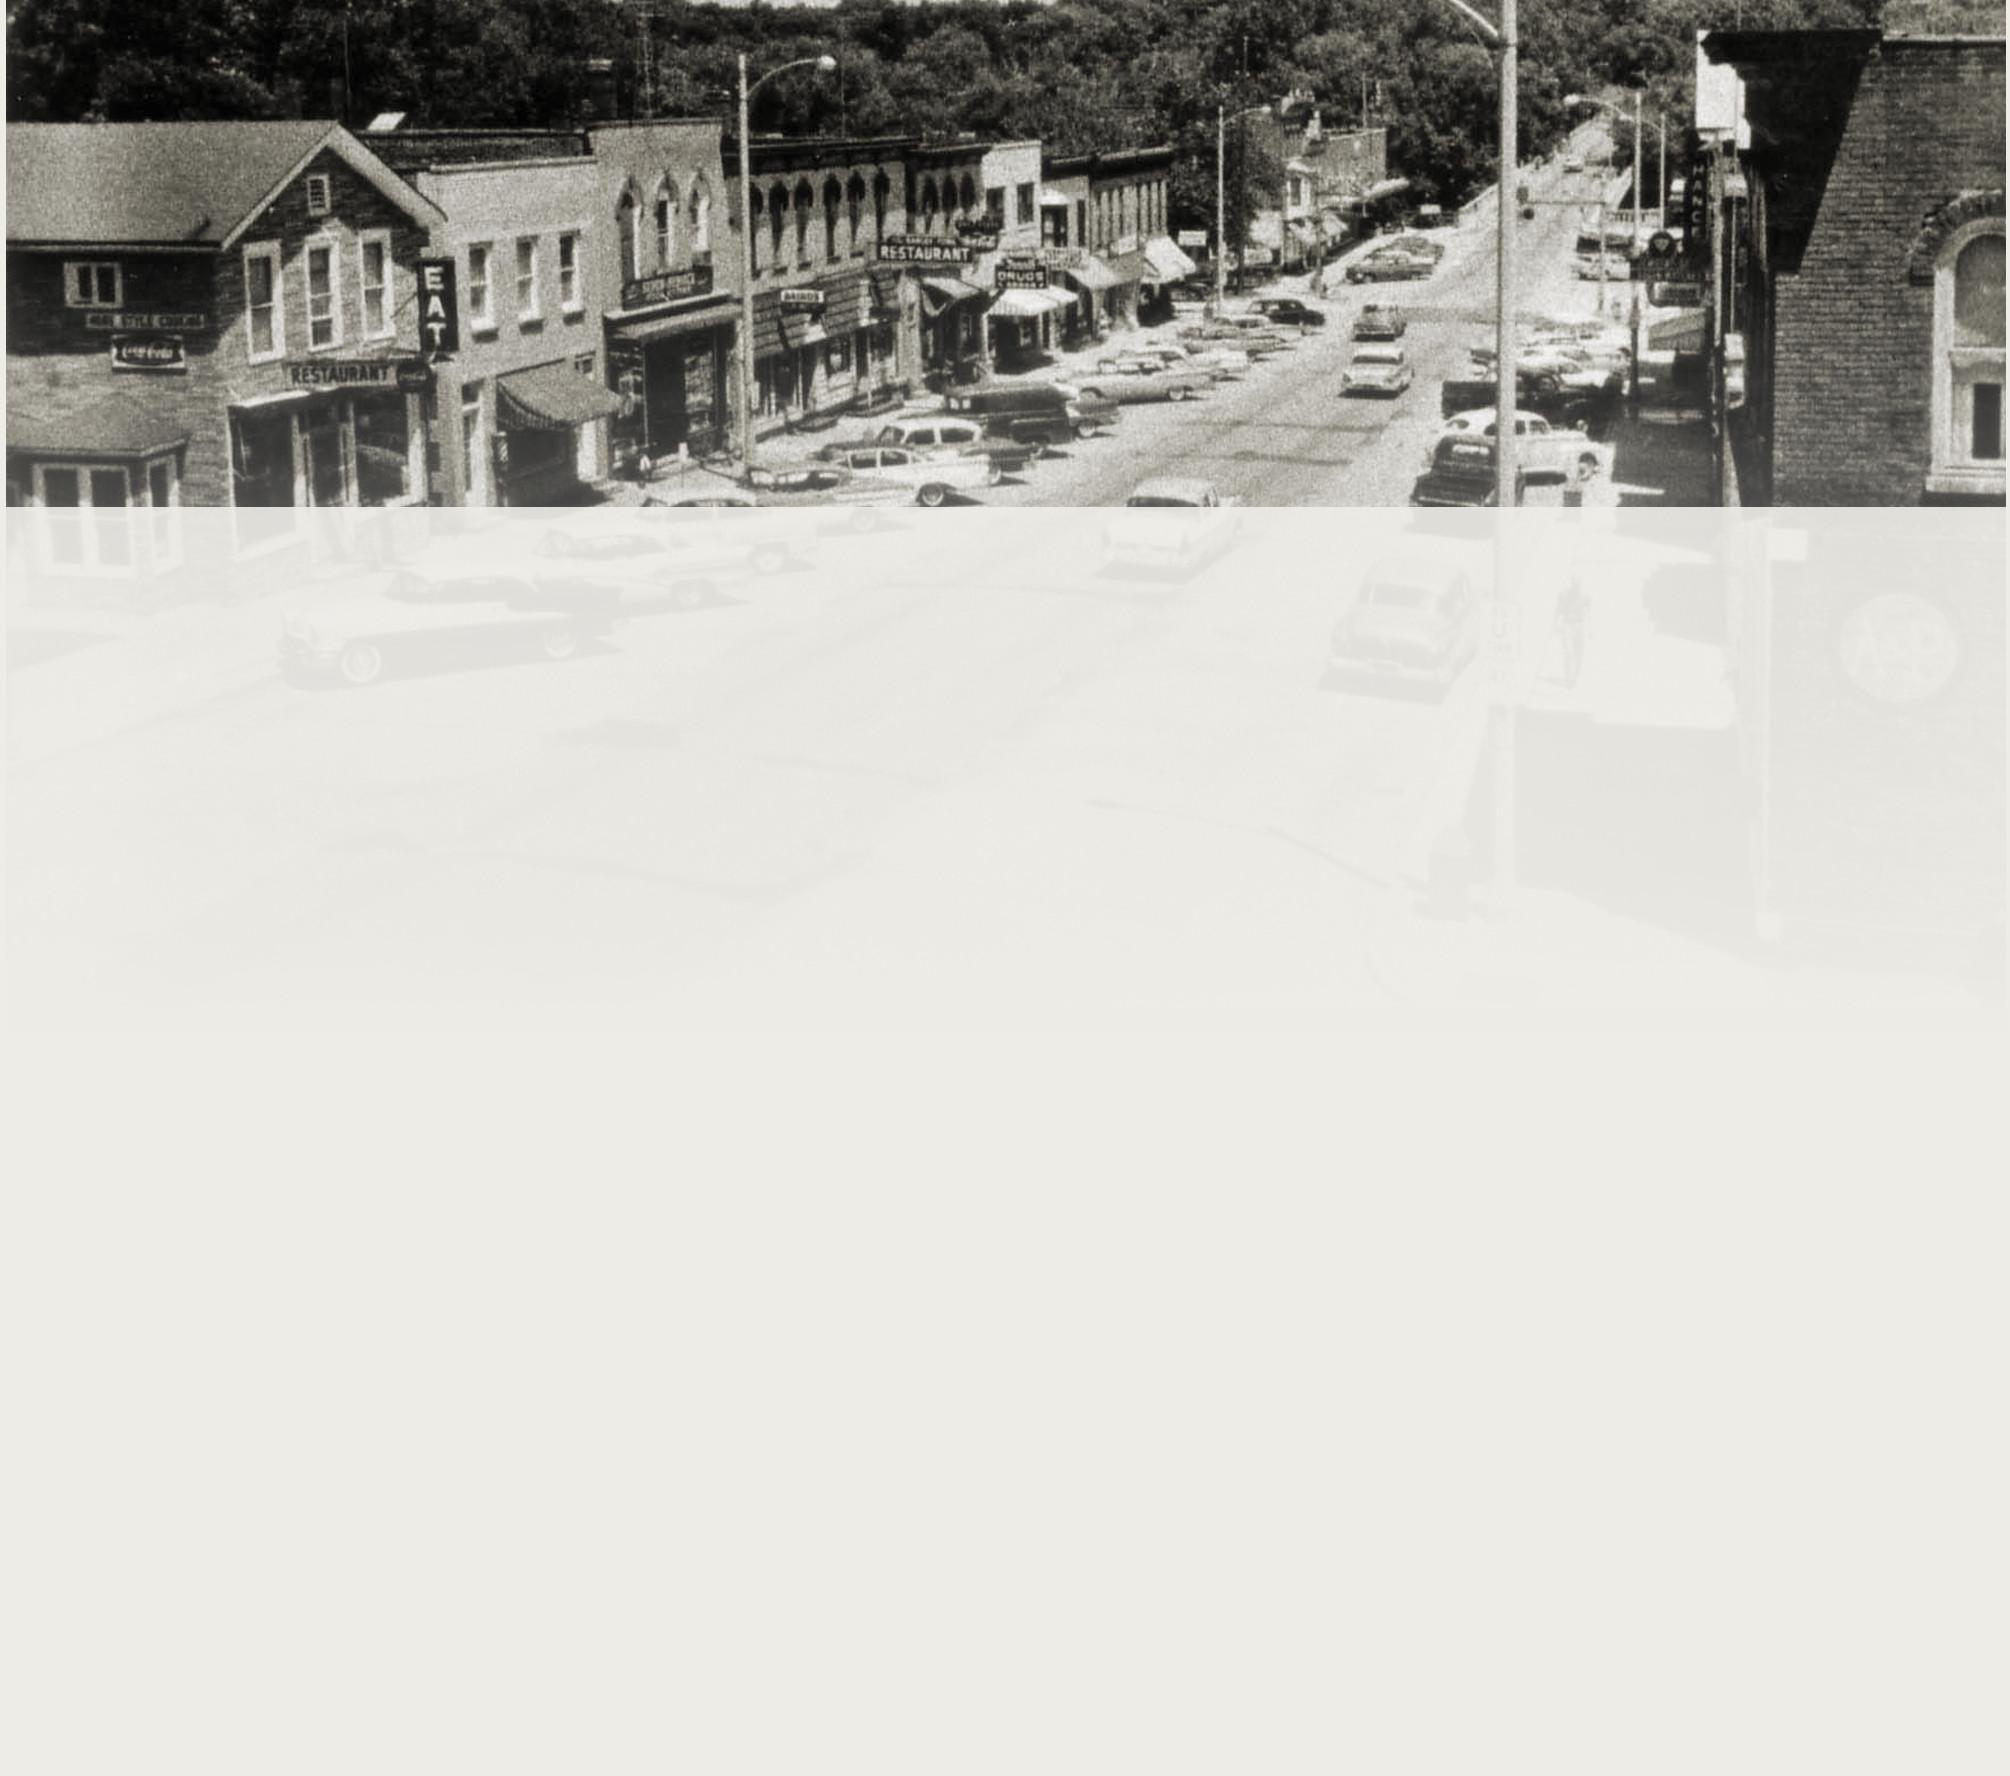 Yorkville Home Design Center: Official Website